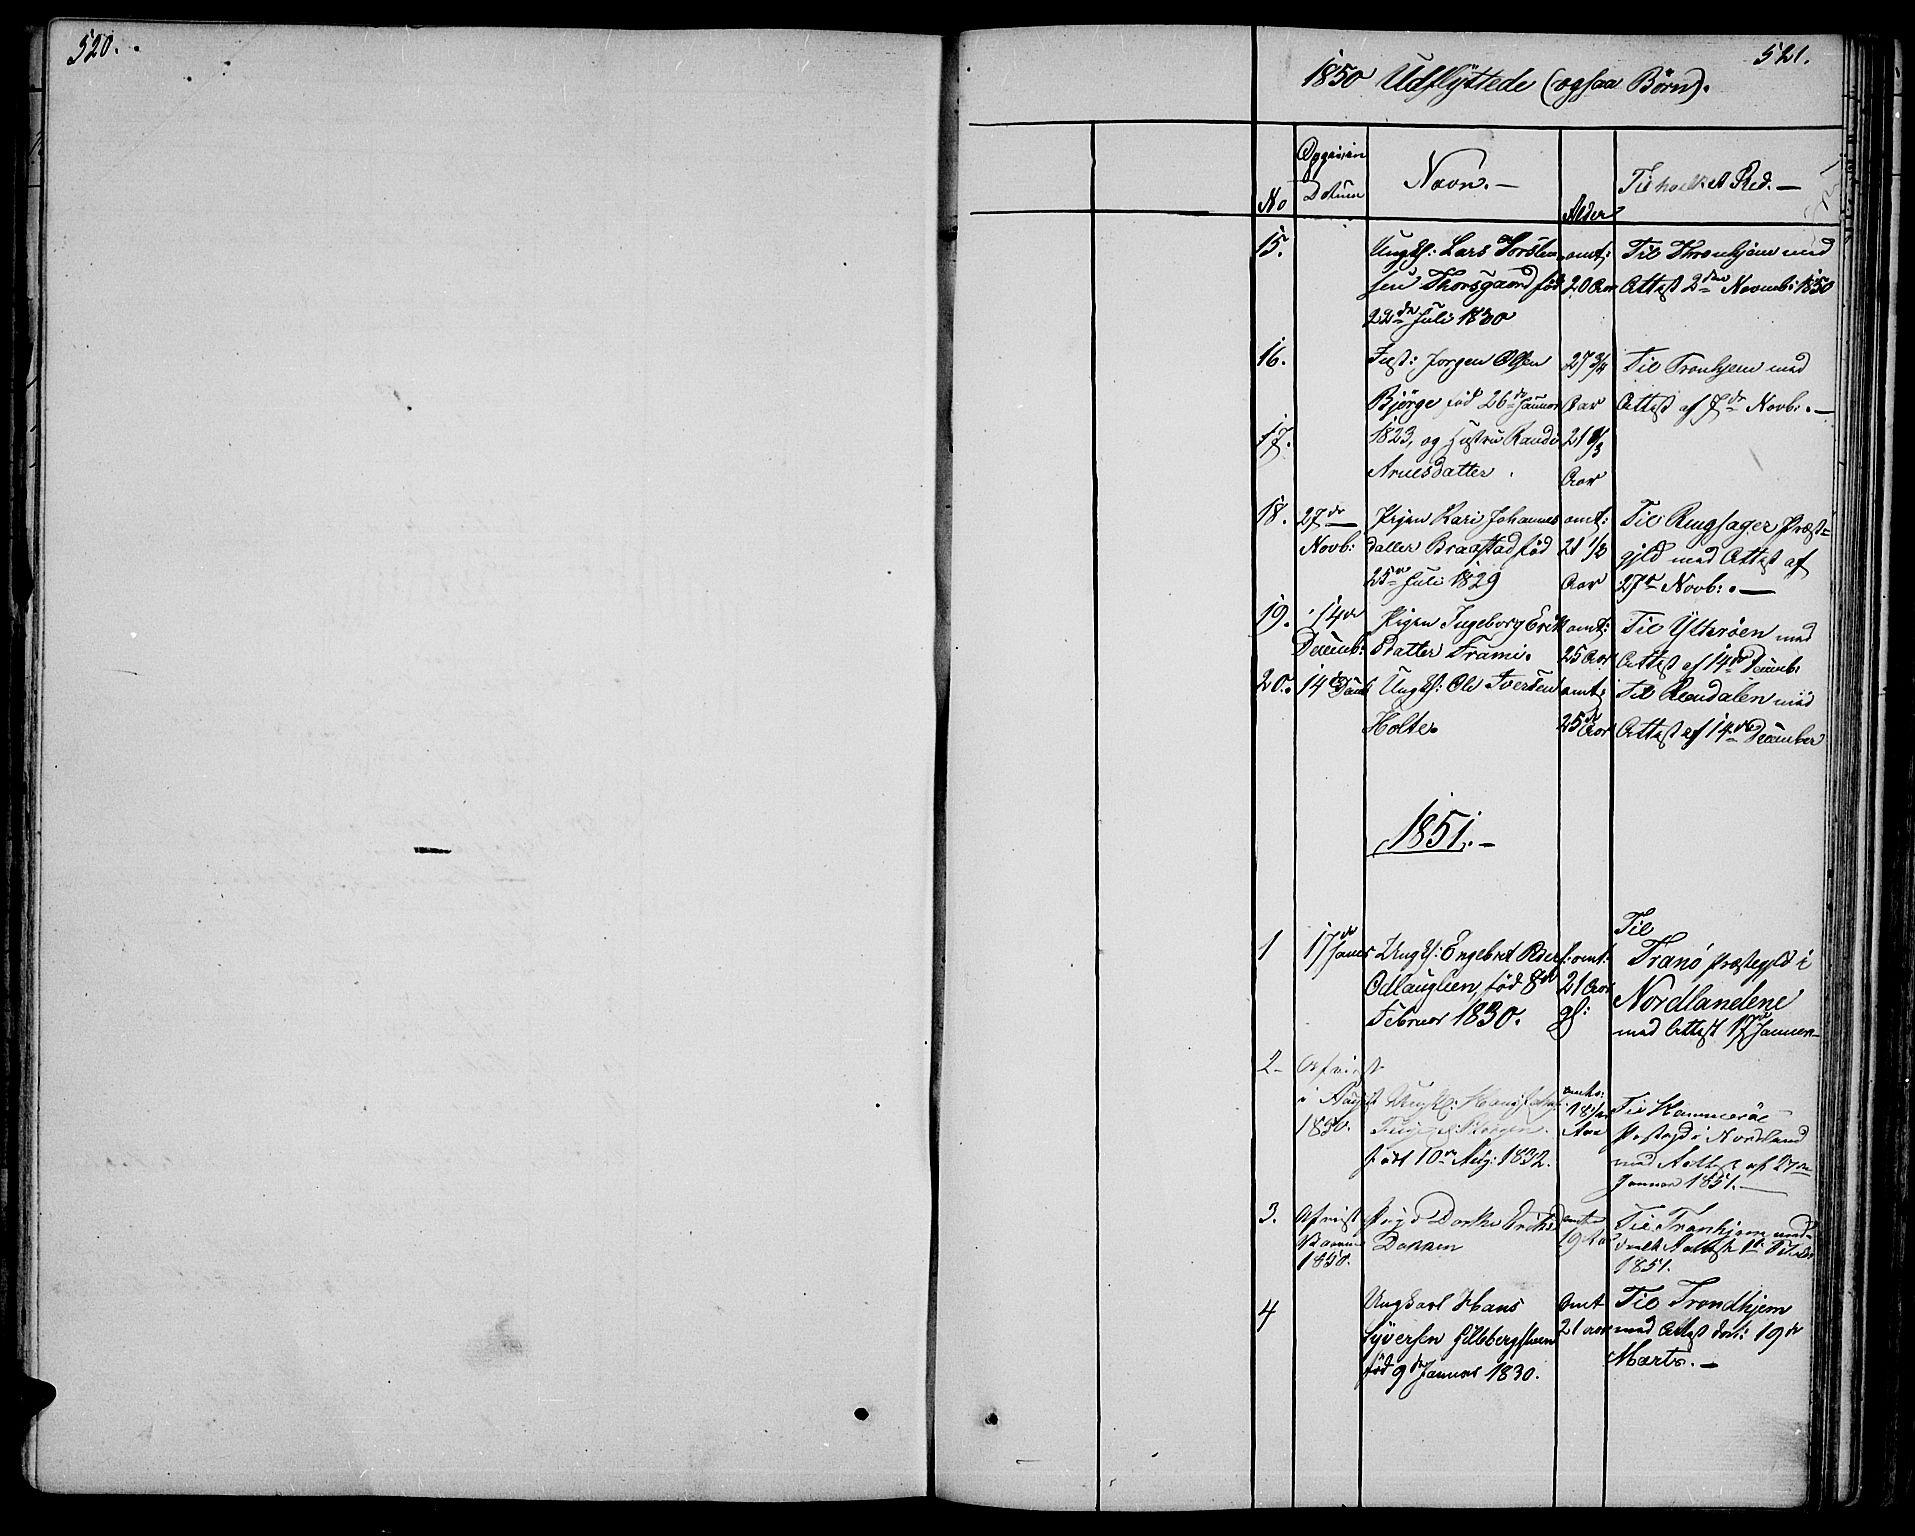 SAH, Ringebu prestekontor, Klokkerbok nr. 2, 1839-1853, s. 520-521